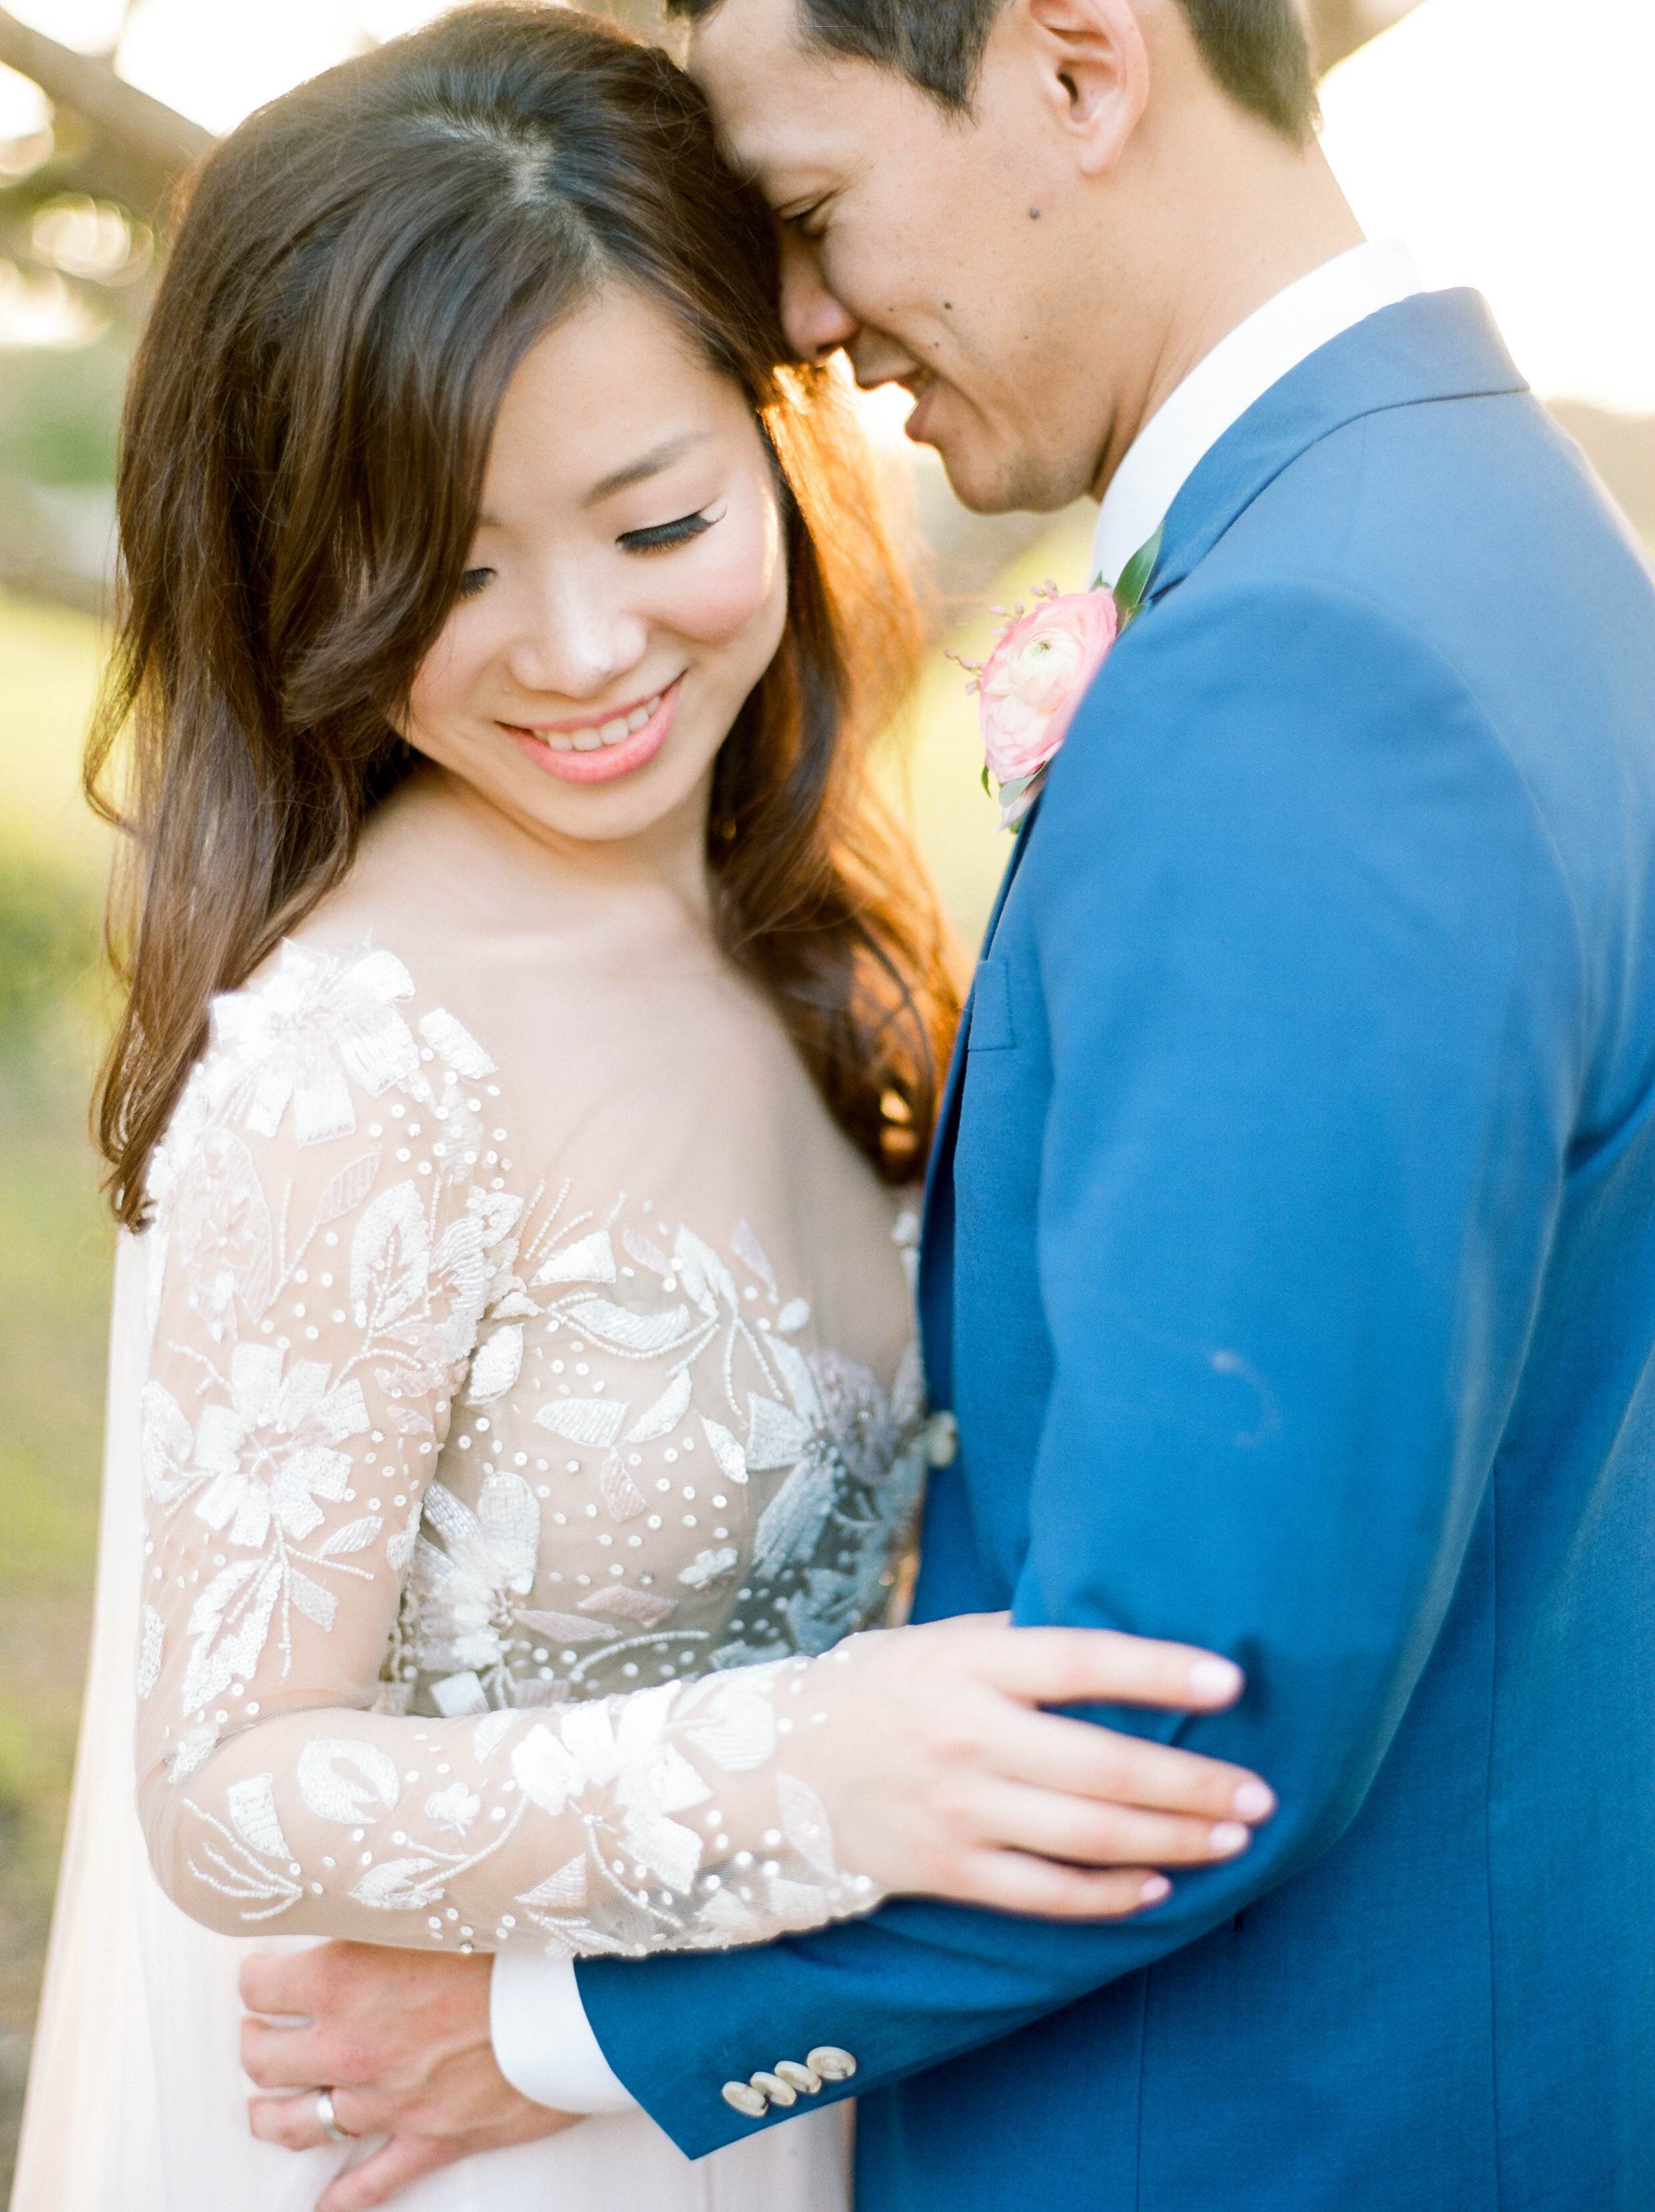 The-Knot-50-Weddings-50-States-Texas-Winner-Dana-Fernandez-photography-houston-wedding-photographer-film-fine-art-destination-20.jpg